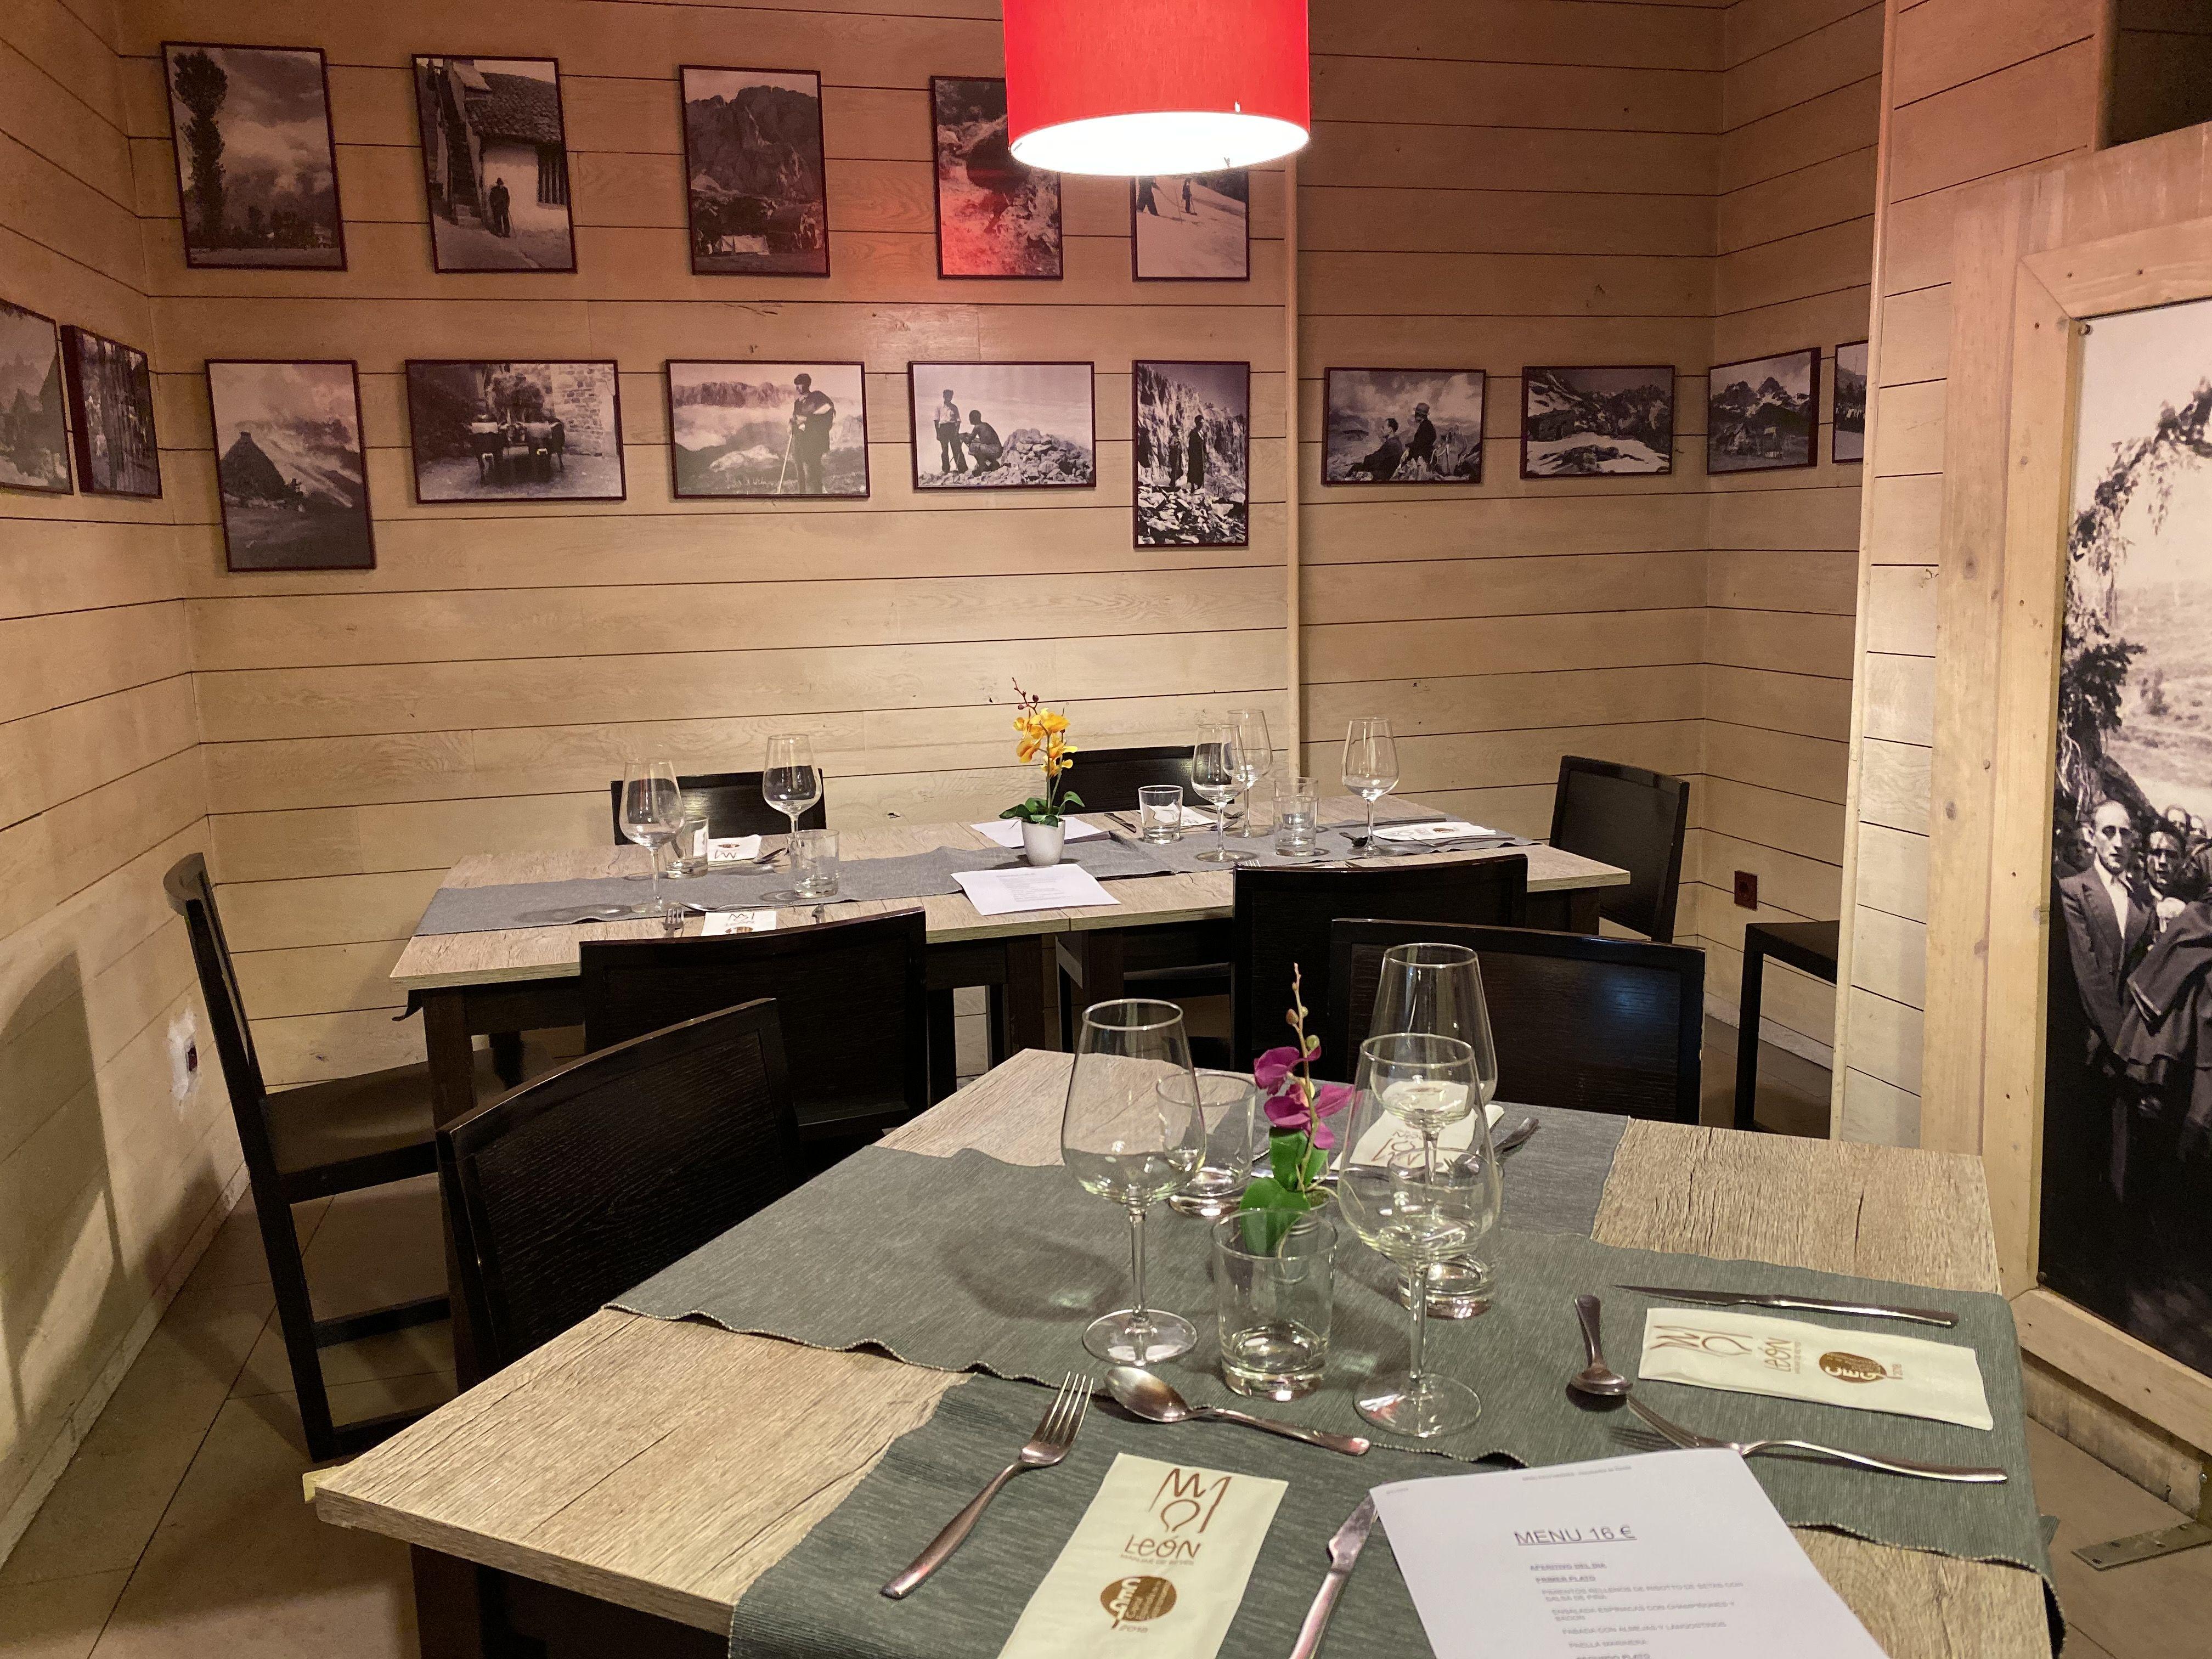 Restaurante de menú en León